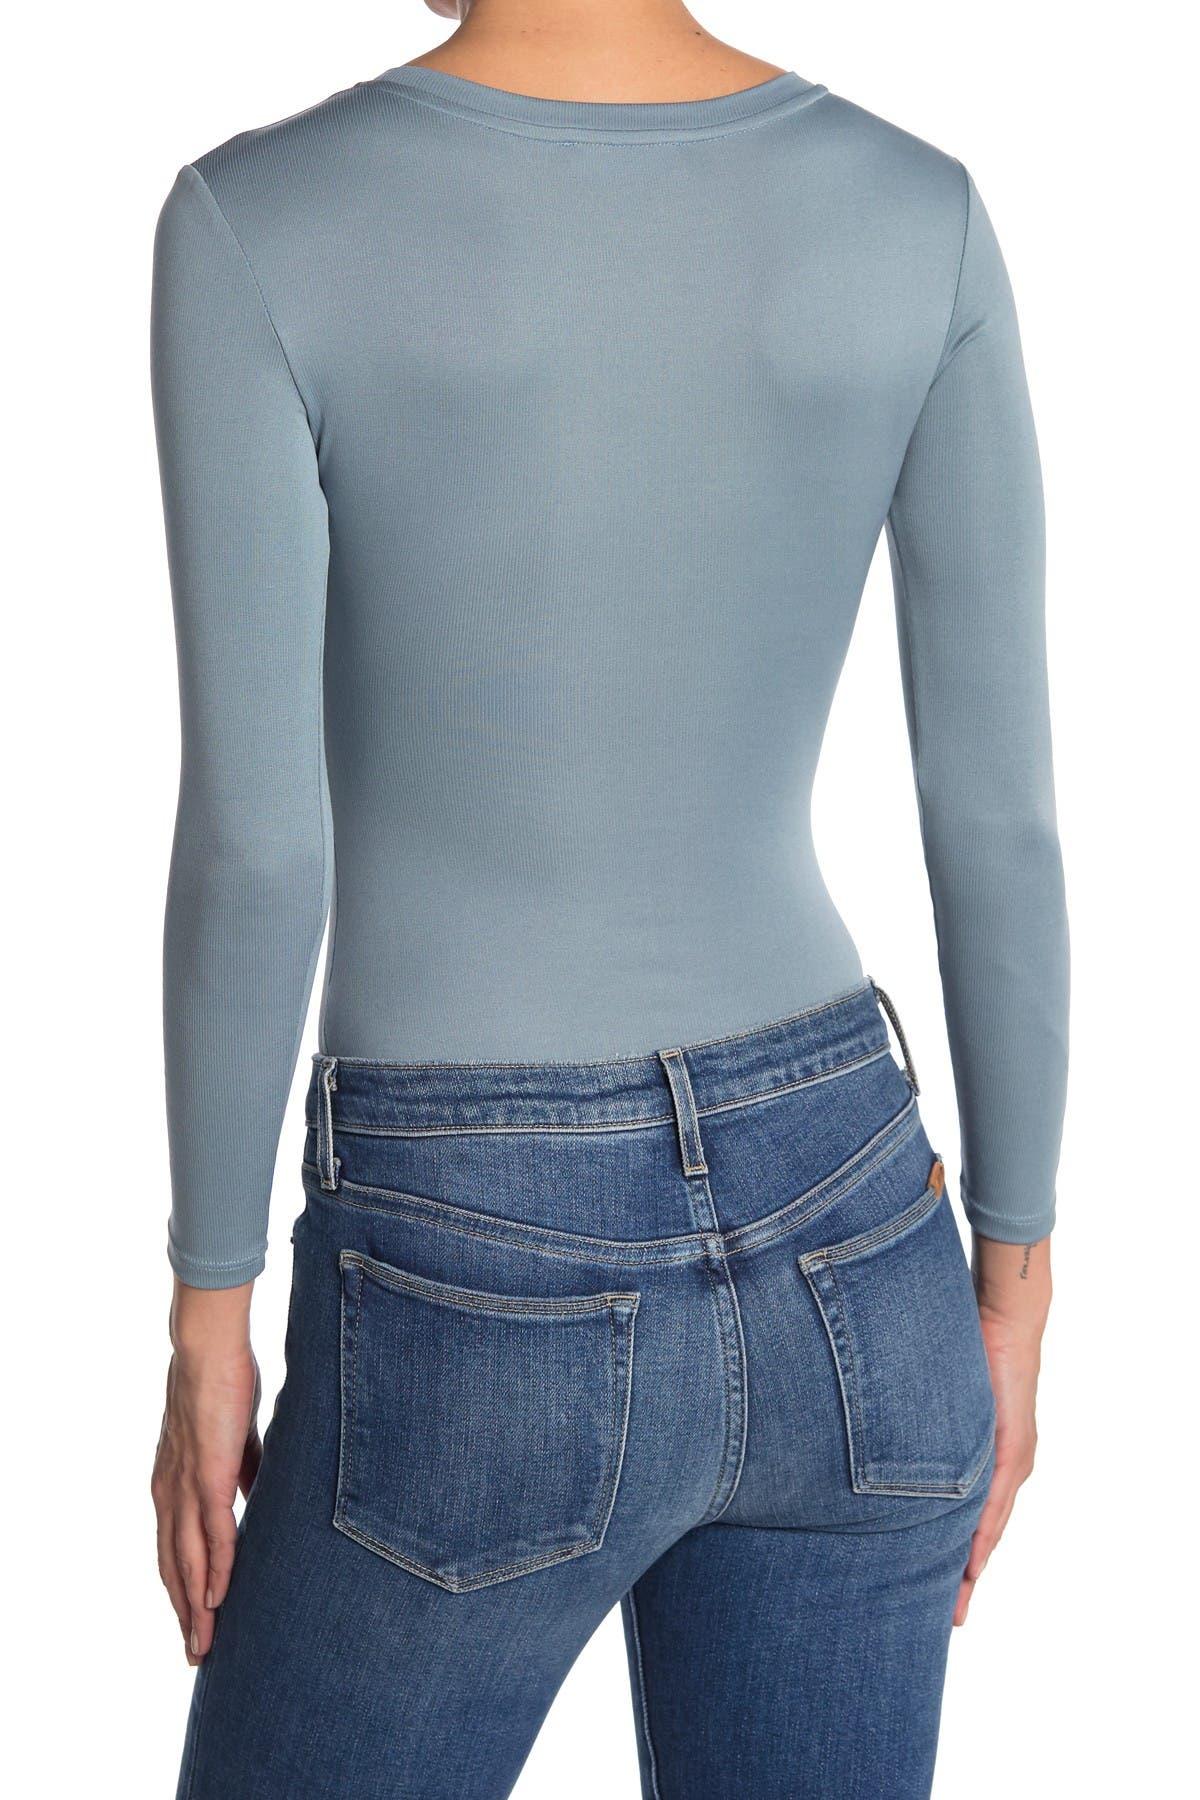 Image of Elodie Ribbed Crew Neck Long Sleeve Bodysuit